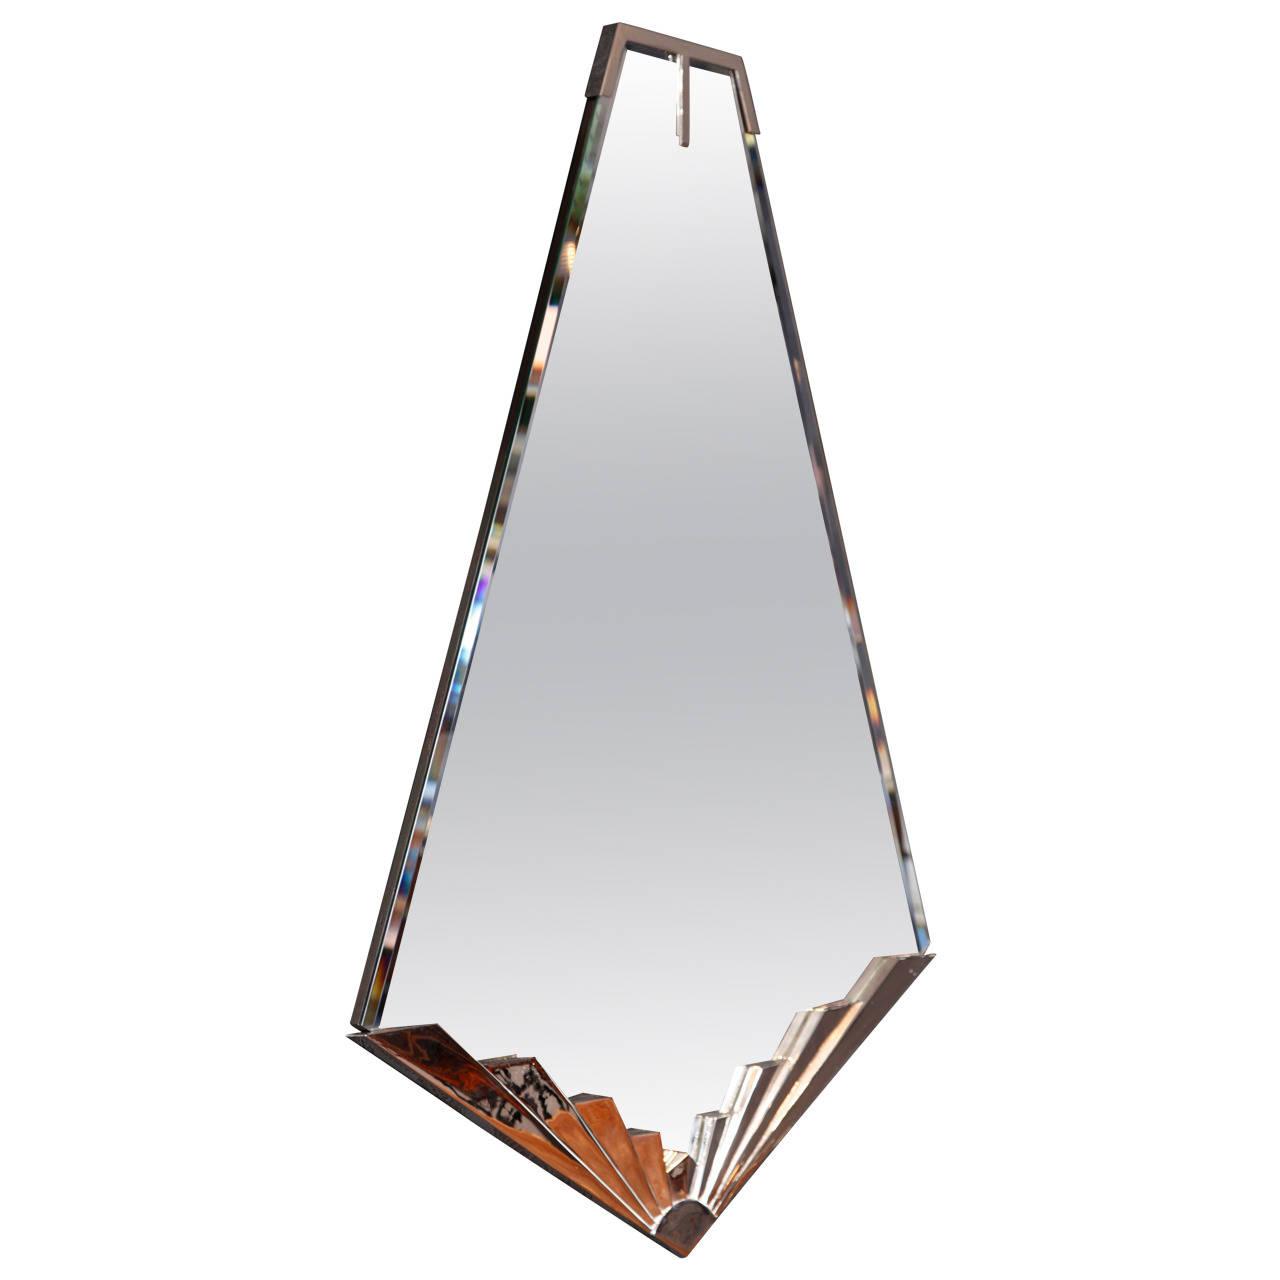 Art-Deco mirror